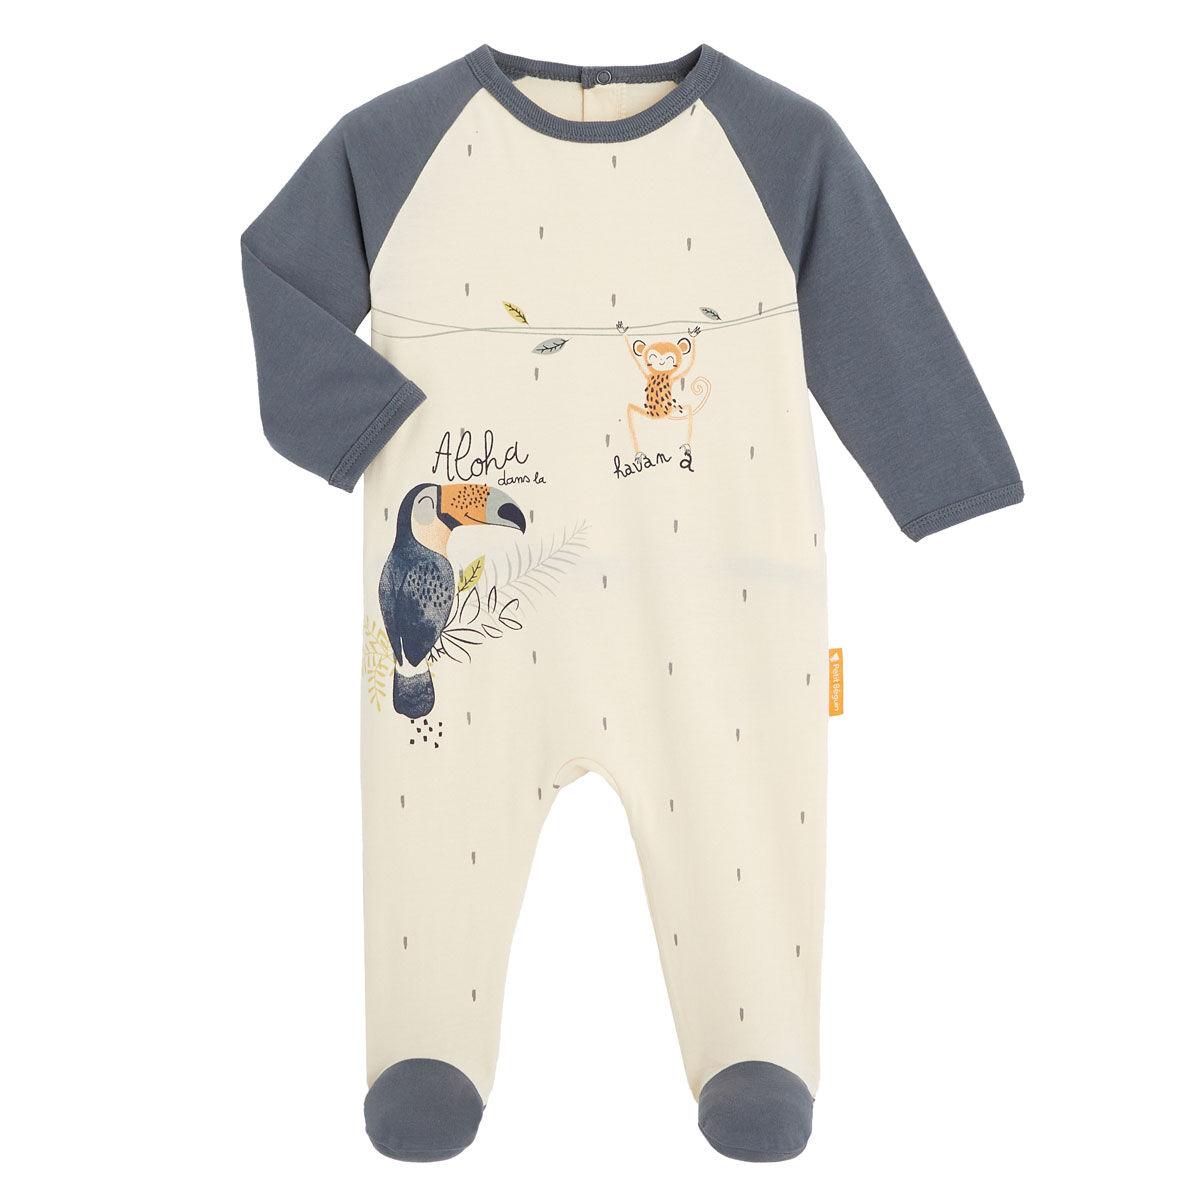 Petit Béguin Pyjama bébé contenant du coton bio Aloha Havana - Taille - 6 mois